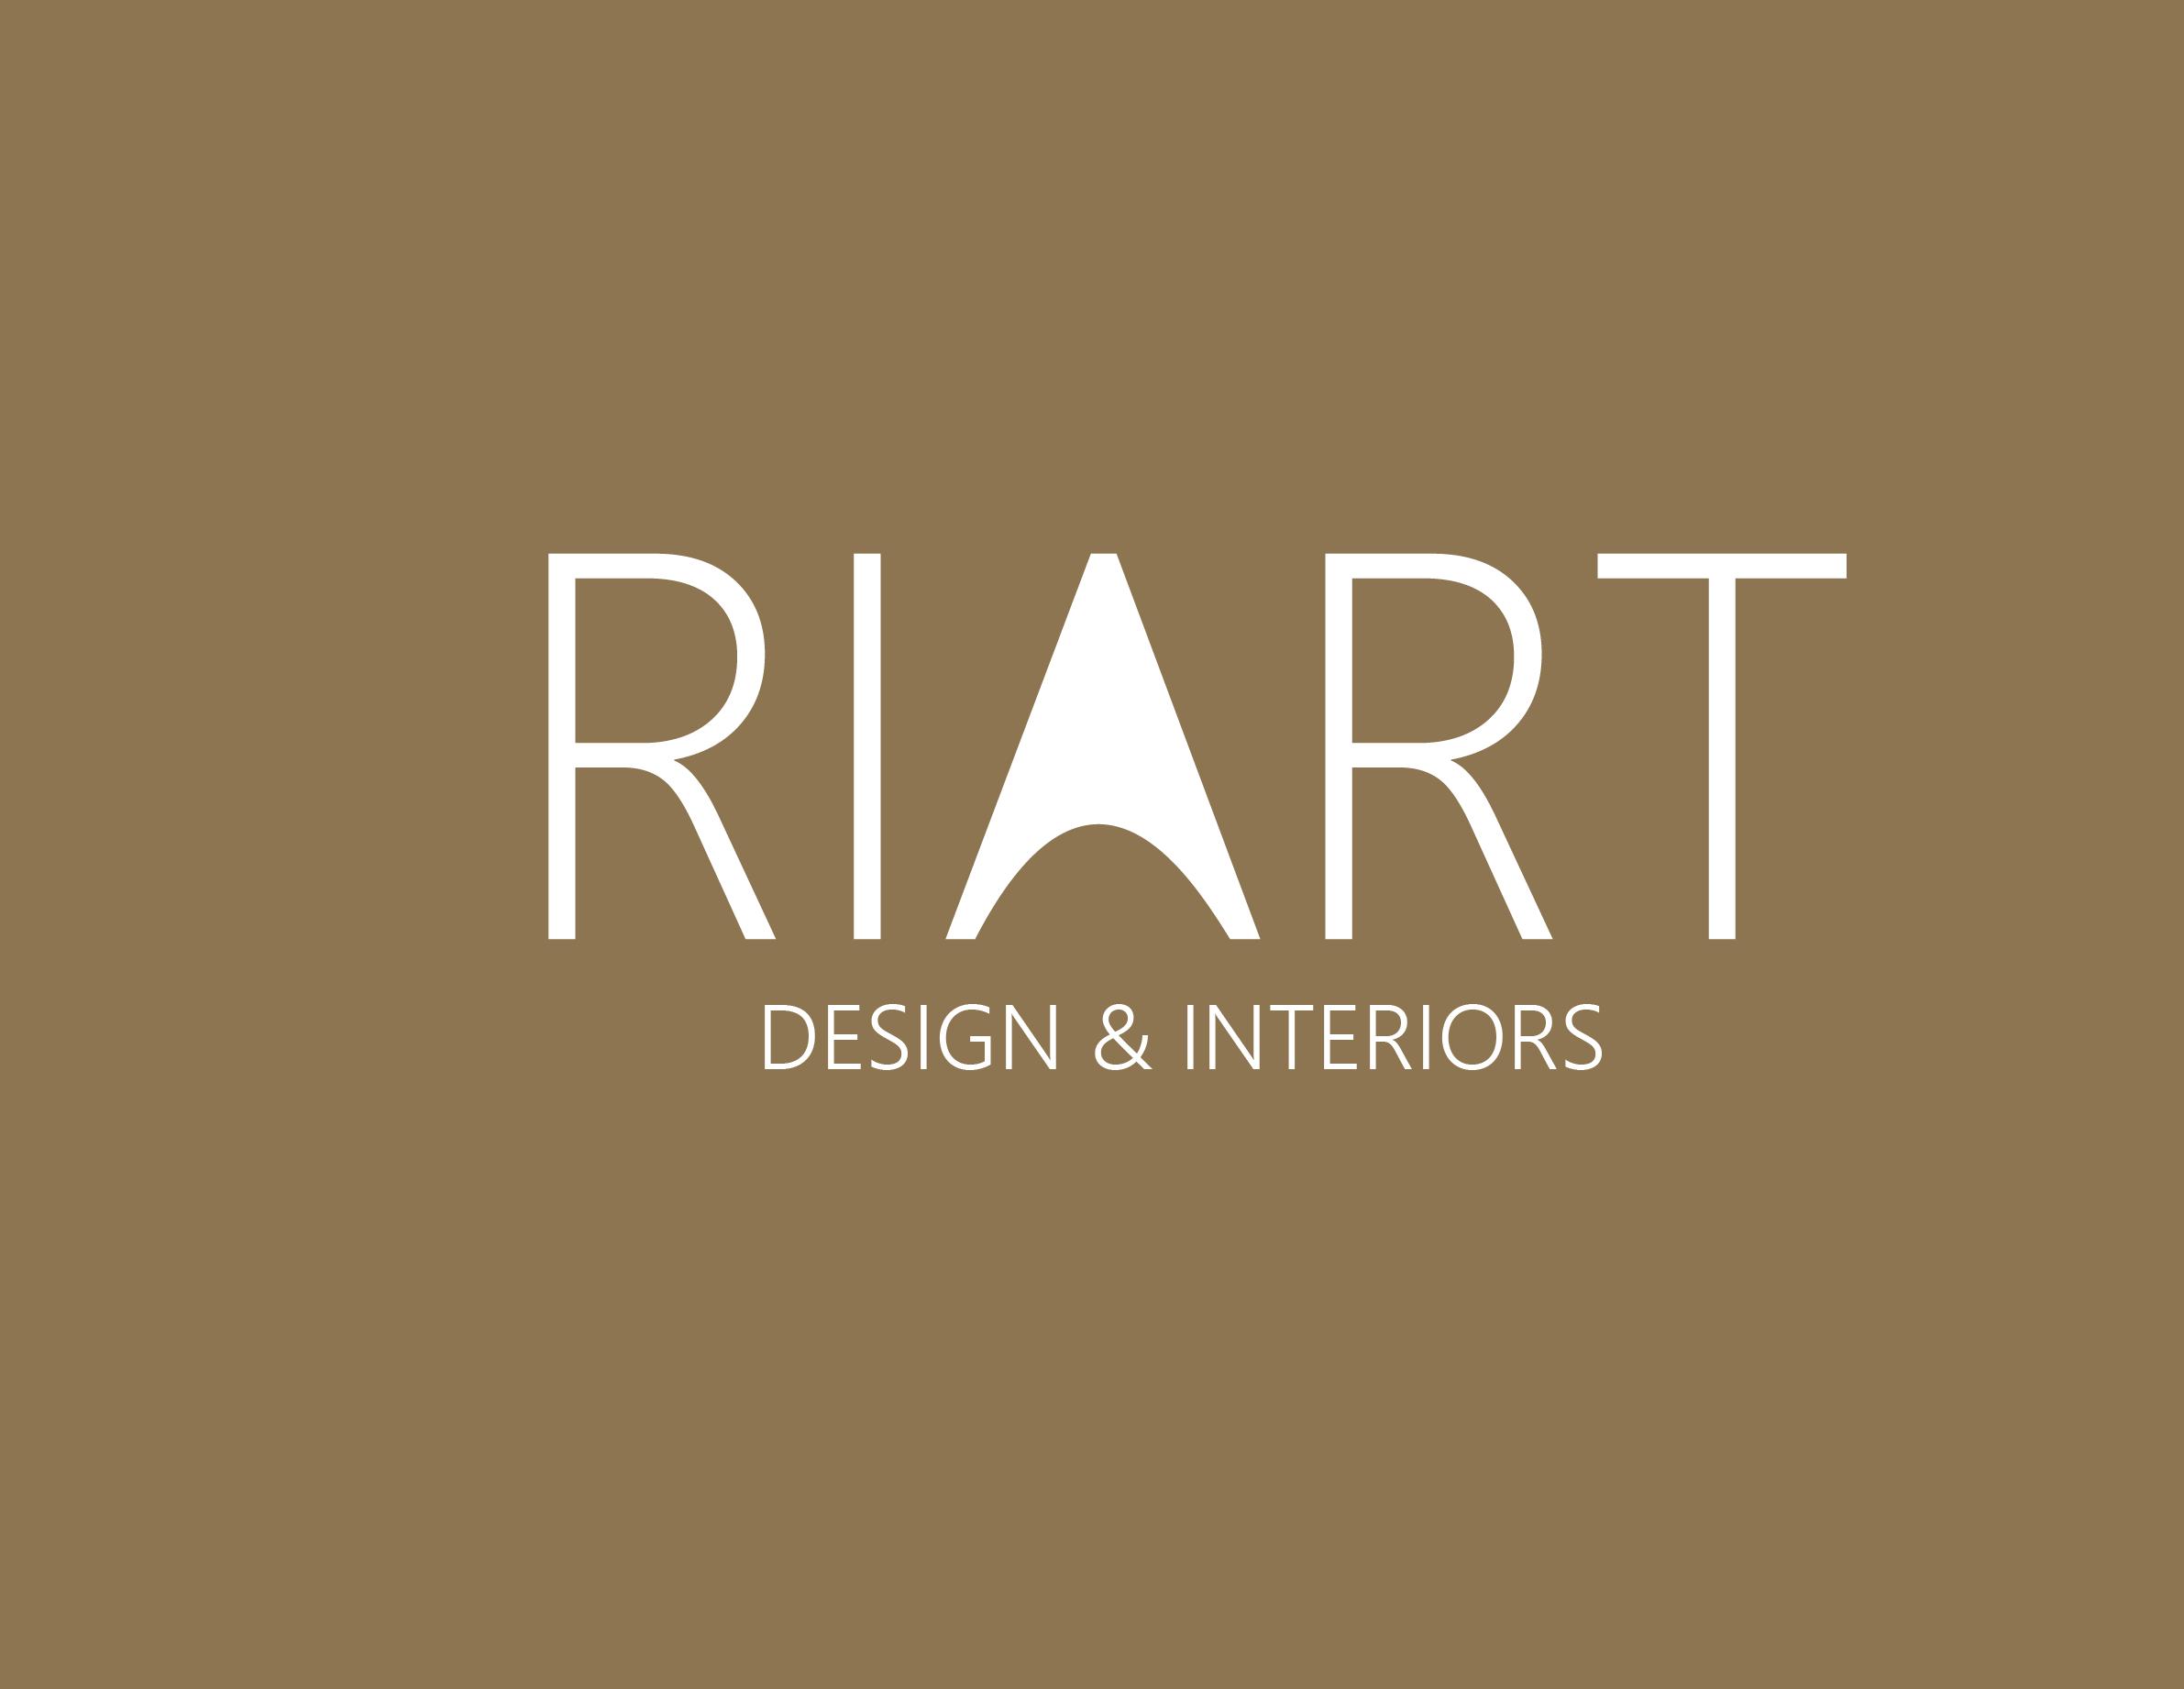 Riart - Design De Interiores